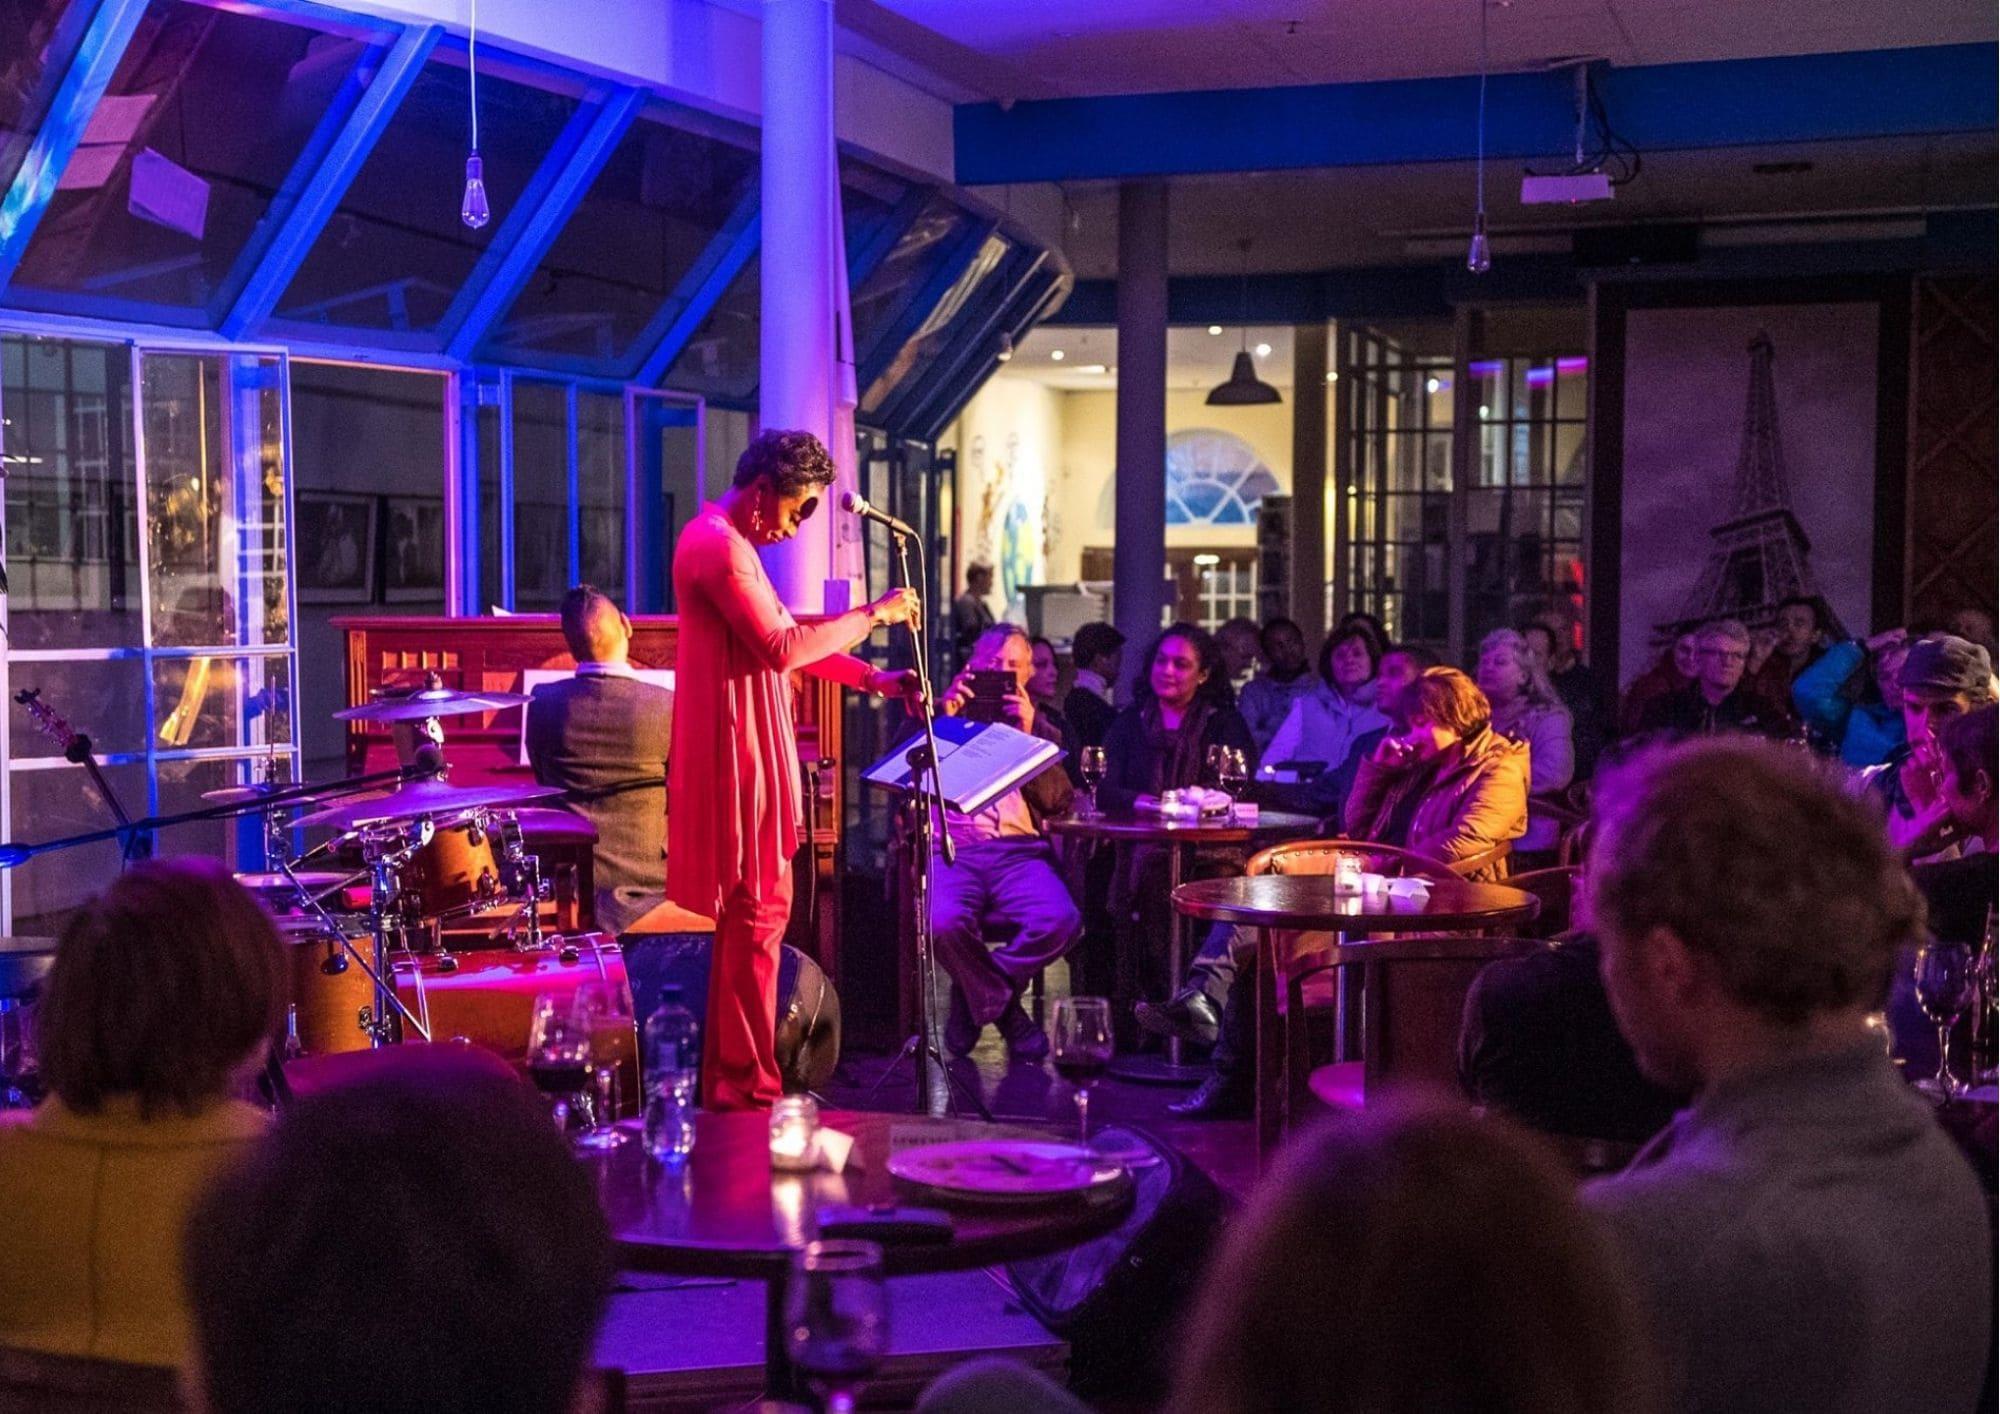 Jazz night 2 Alliance Française du Cap